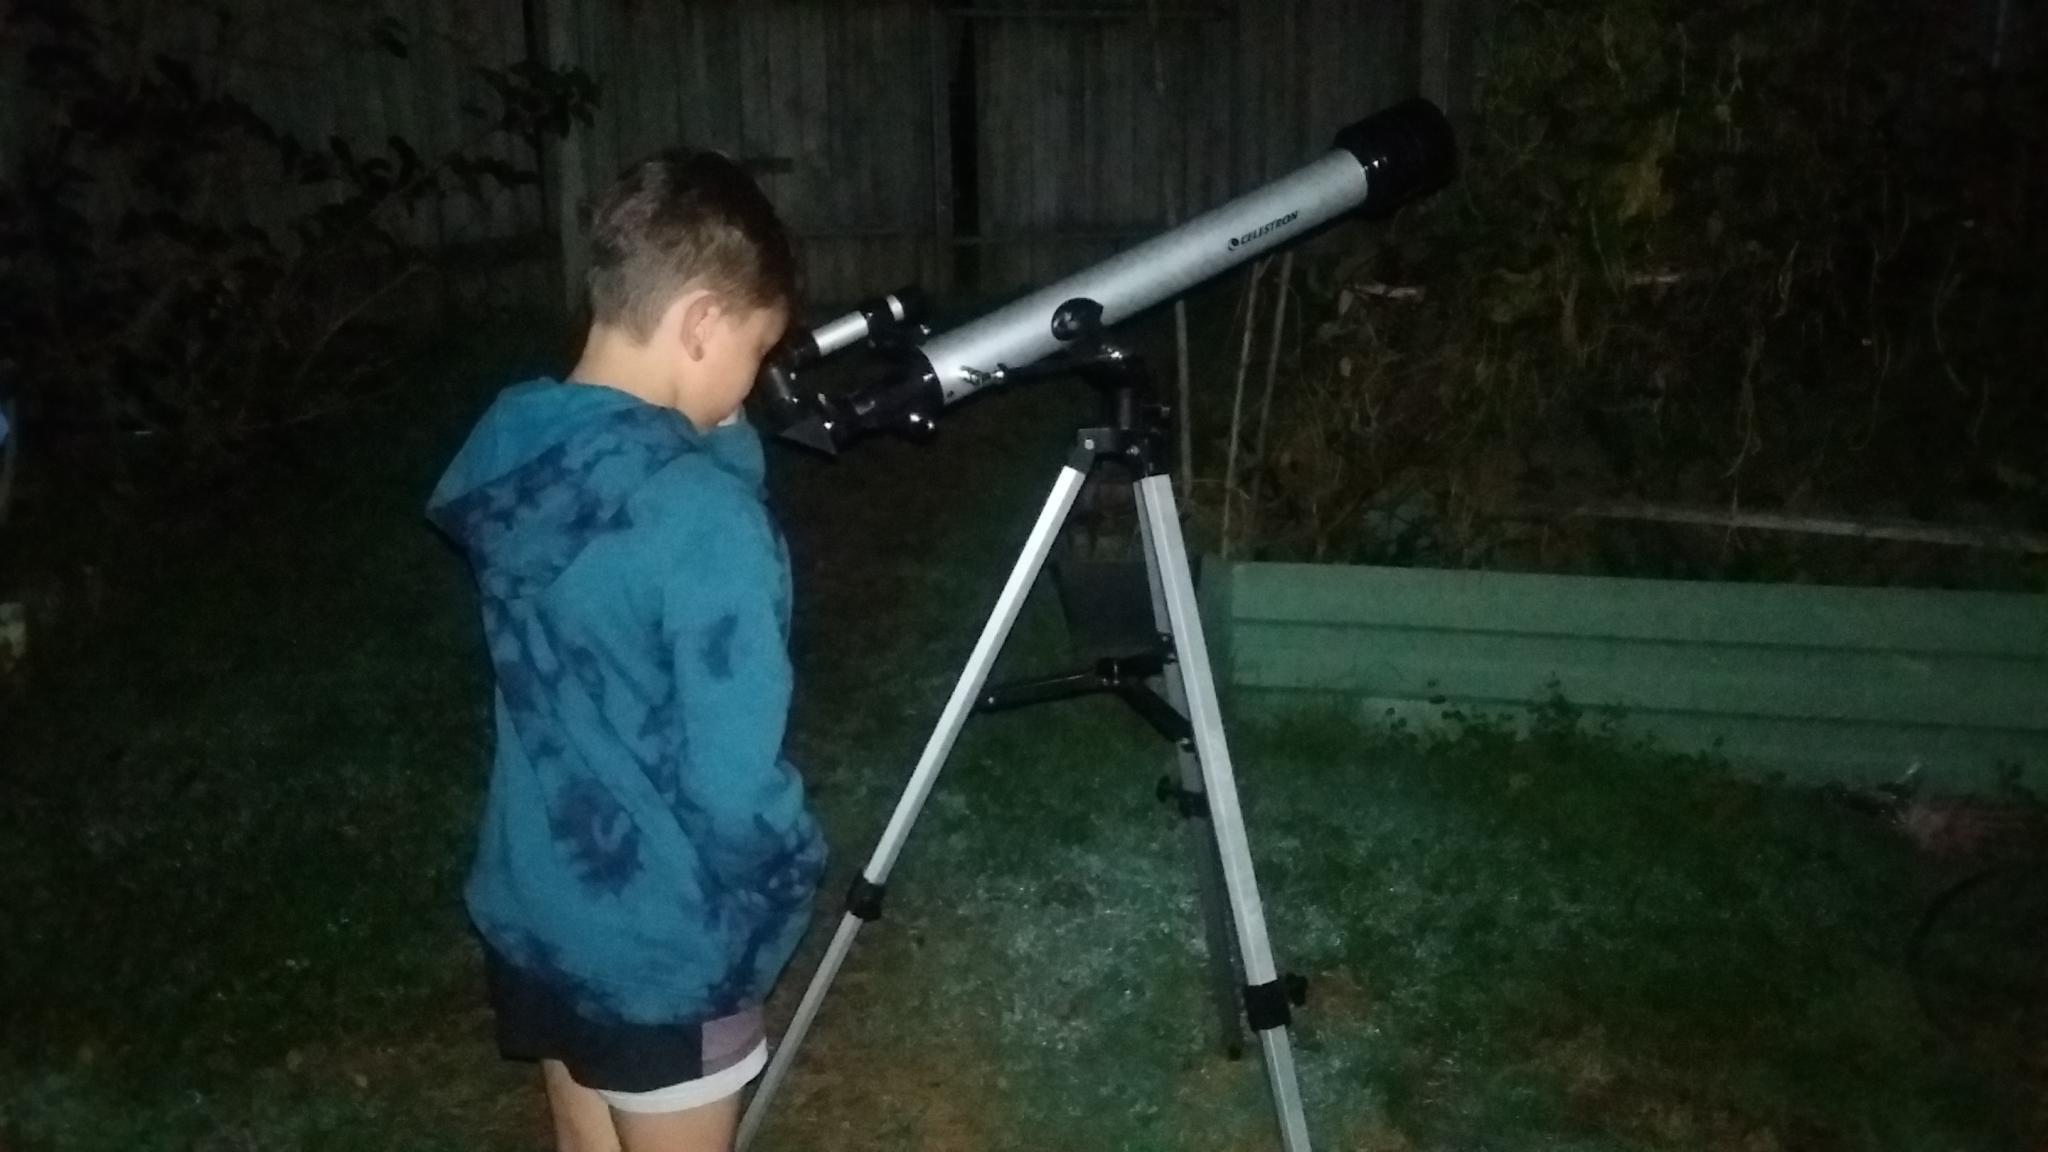 Recommend a telescope-20210526_183612-jpg